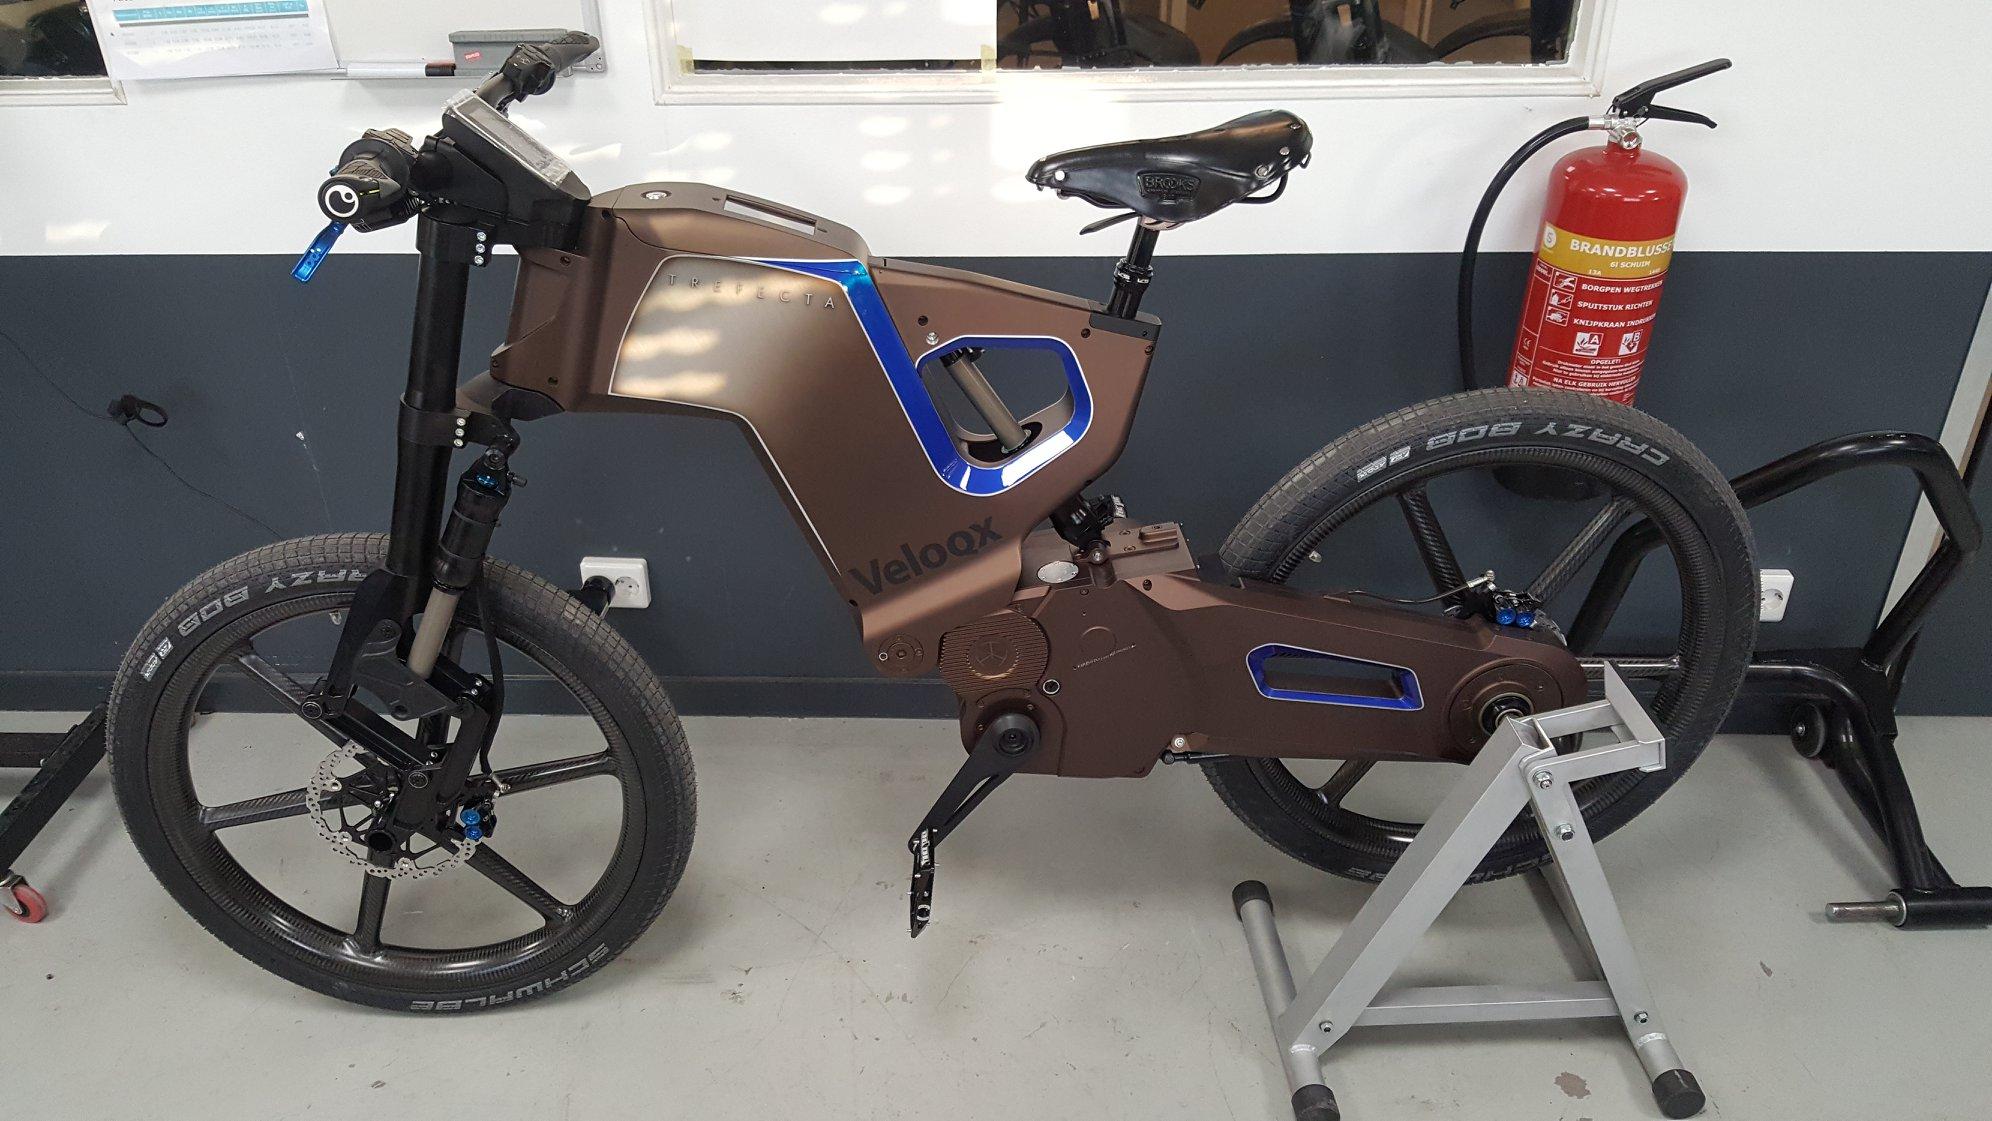 Trefecta Urb L1e E Bike Crazy New Colors And Electric Abs